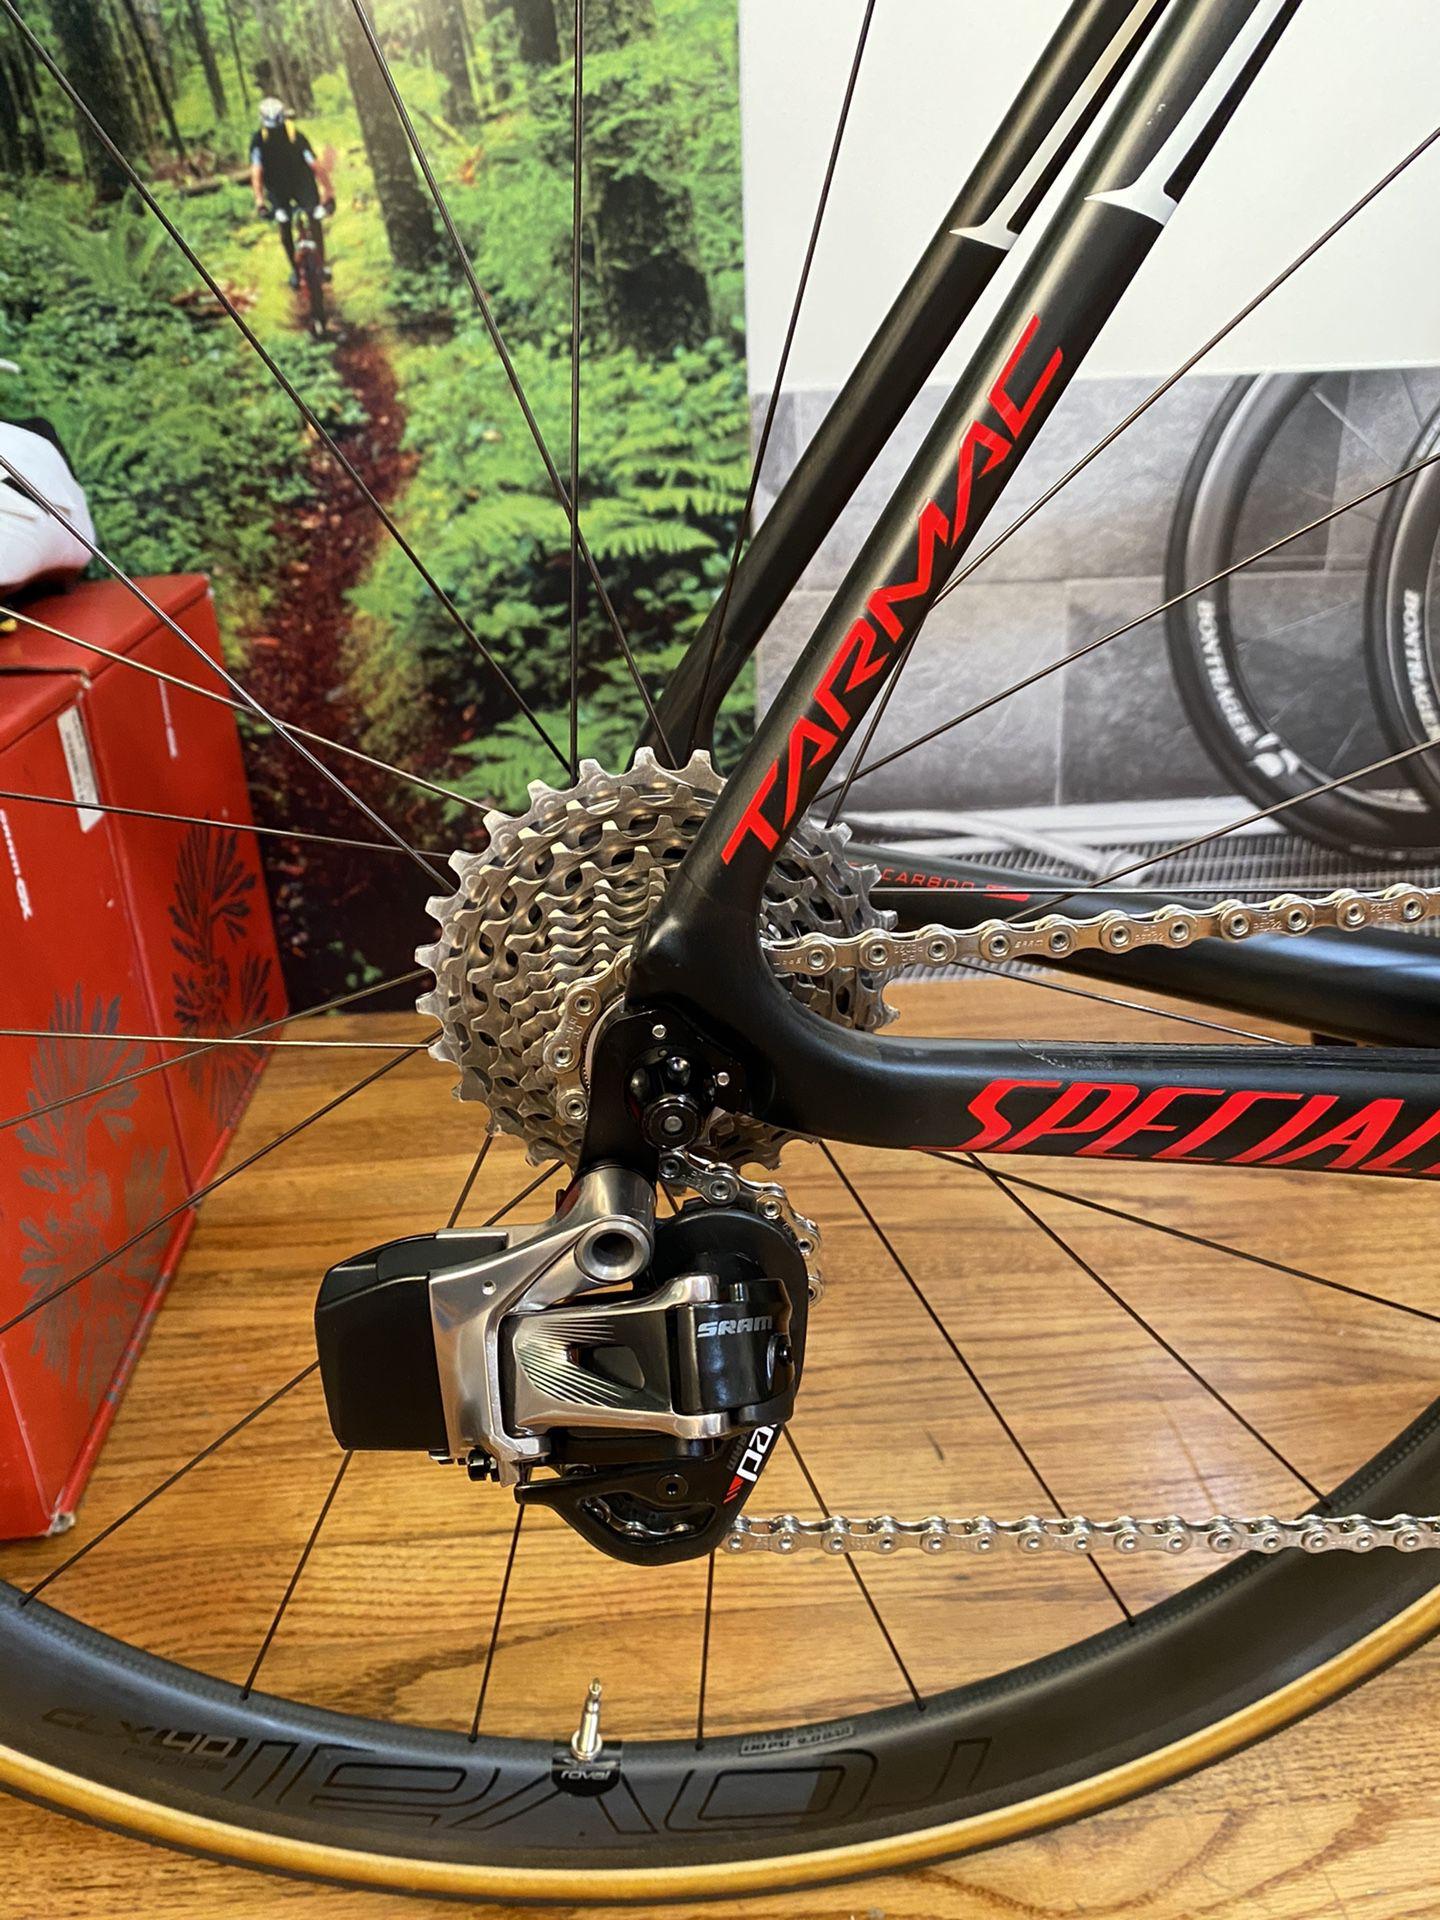 2017 Specialized S-Works Tarmac, Sram eTap, Roval Rapide CLX 40 Carbon Wheels, 11-speed, 58cm, Like New!